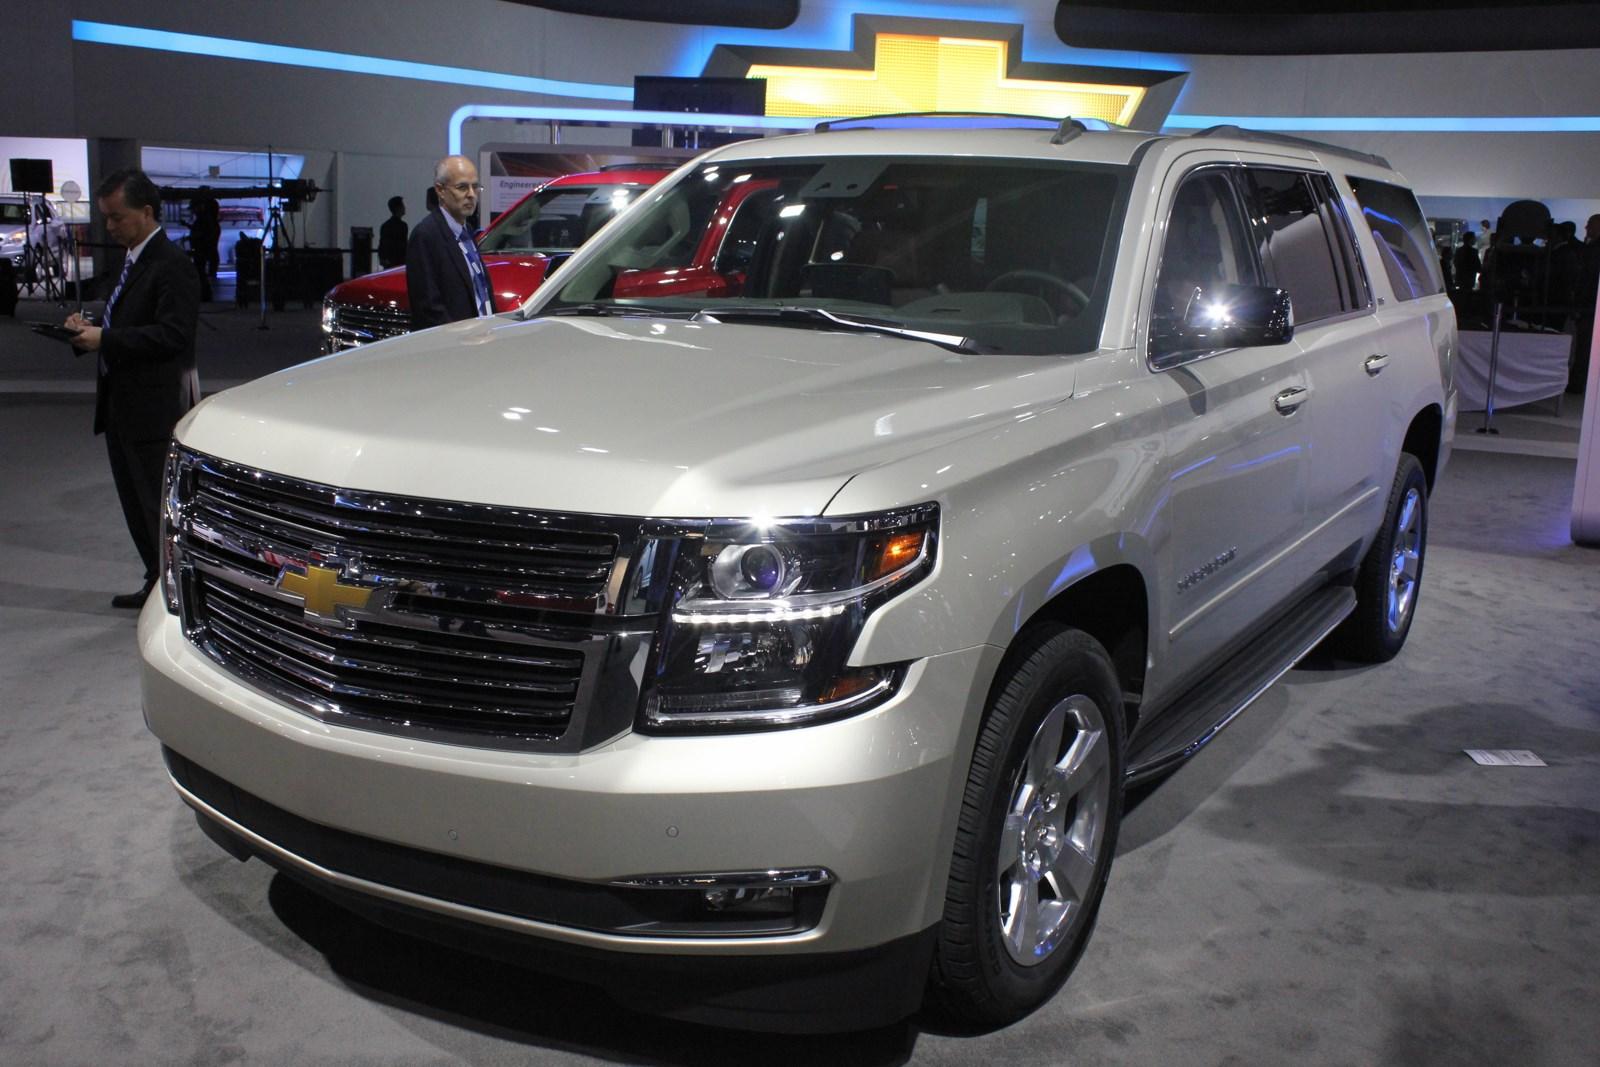 2015 Chevrolet Suburban front three quarters